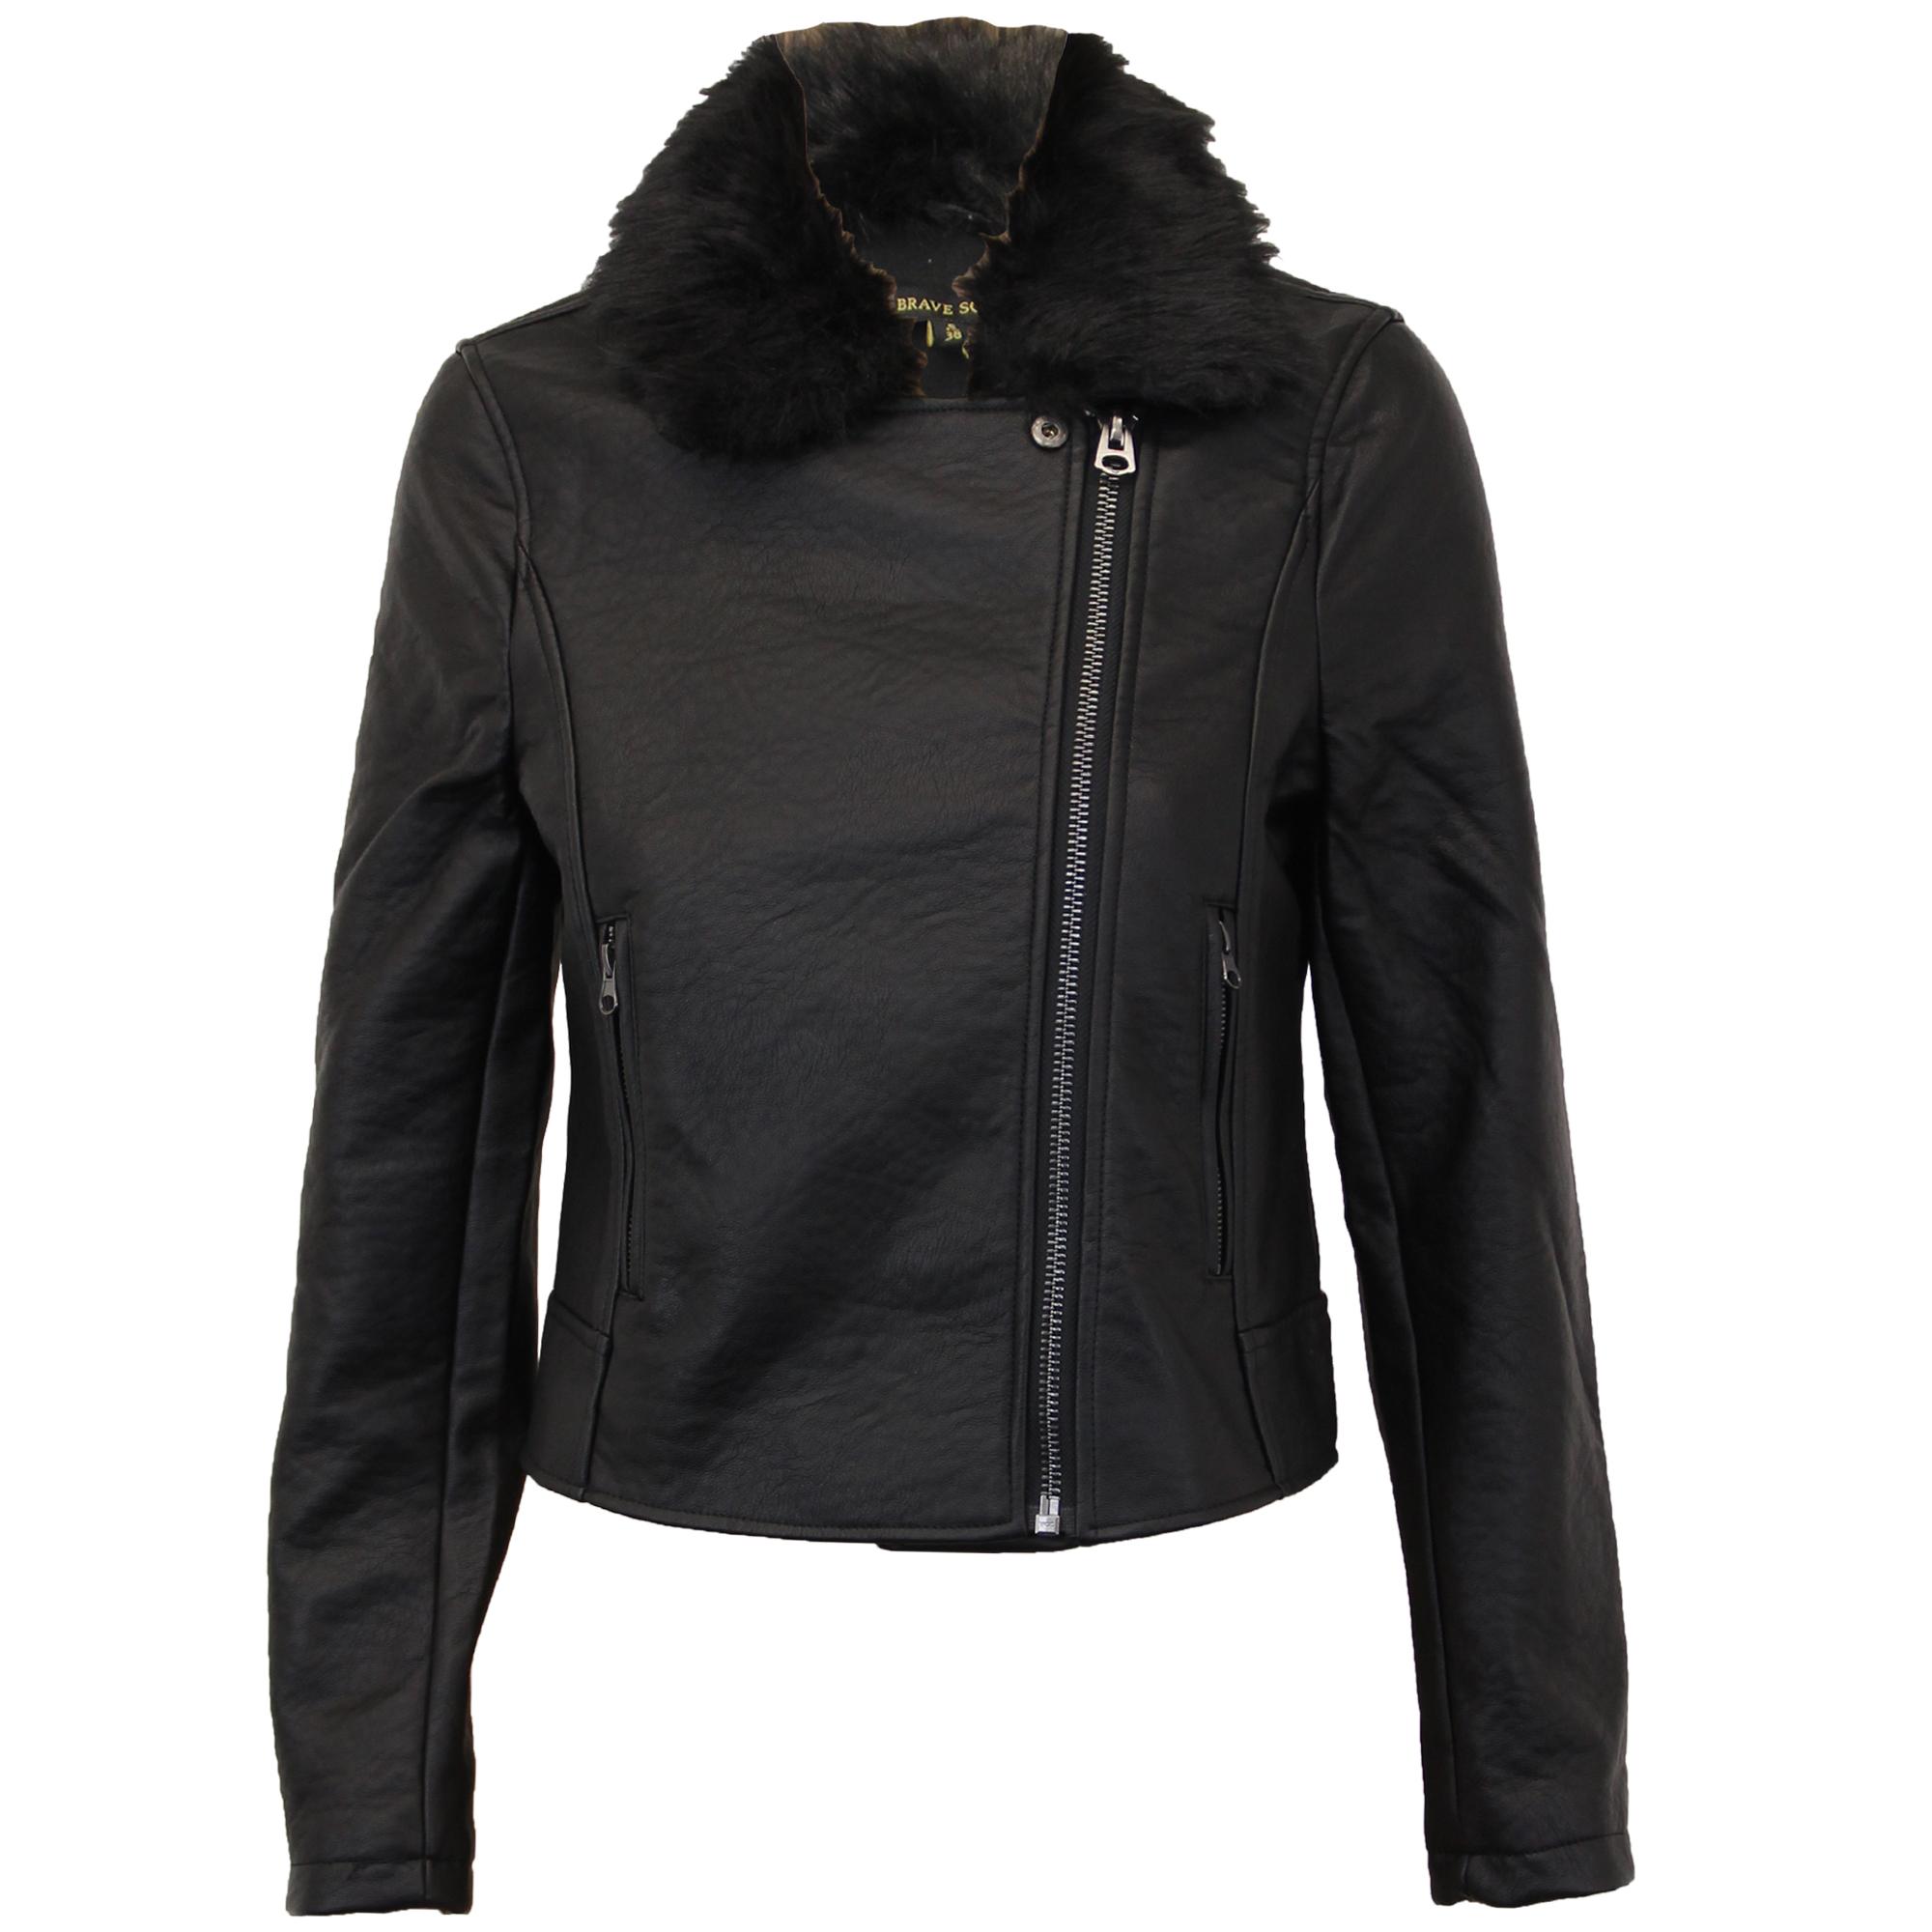 Ladies Biker Jacket Brave Soul Womens Coat PU PVC Leather ...